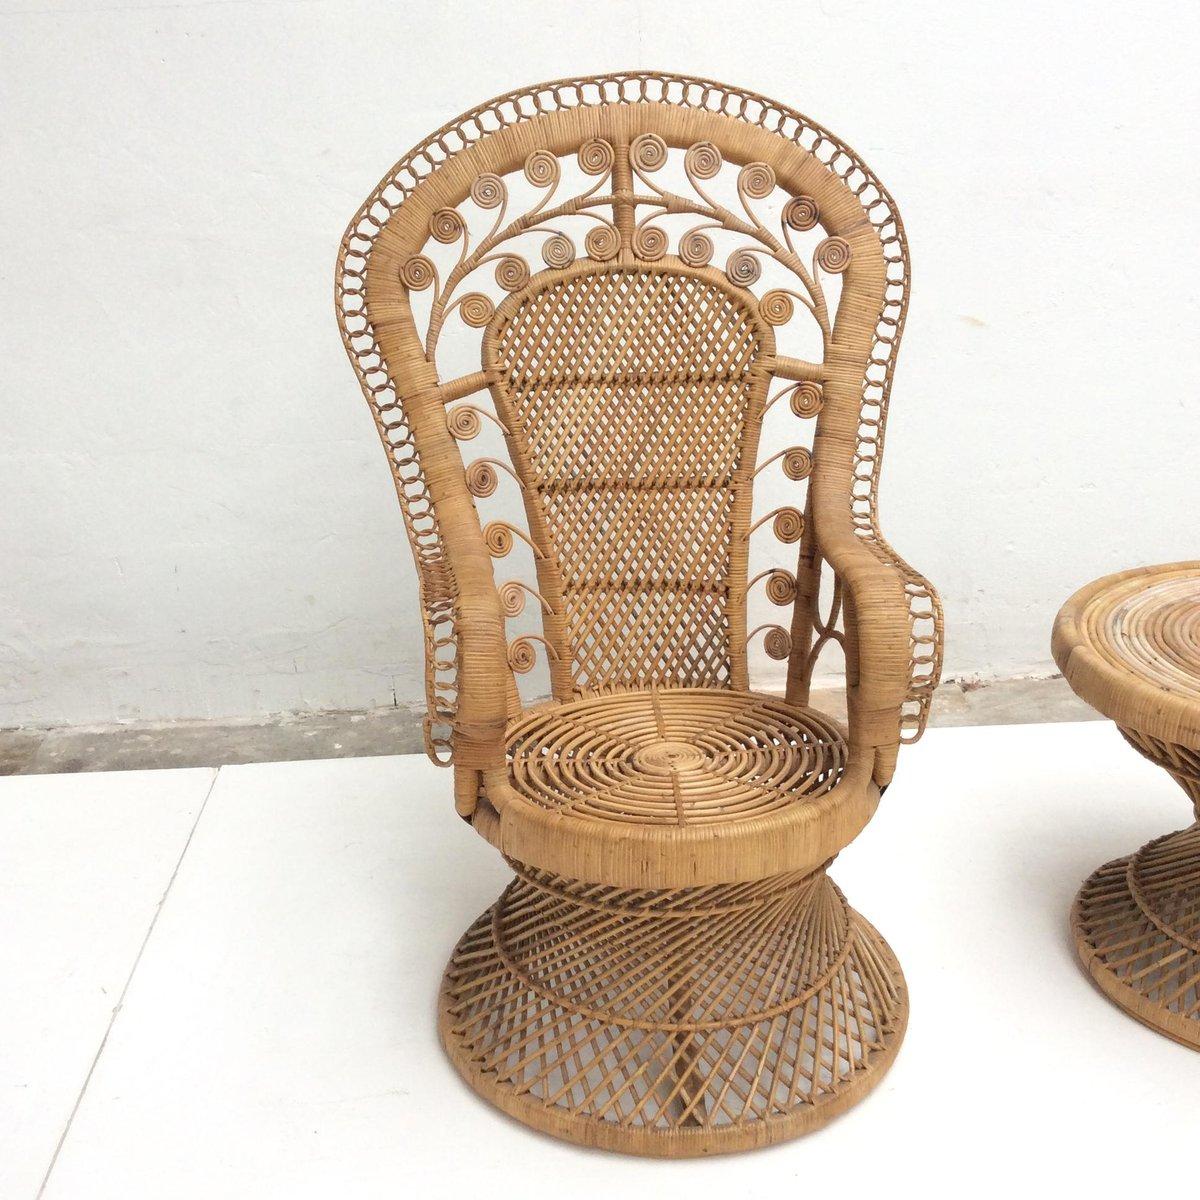 fauteuil emmanuelle vintage en rotin indon sie 1970s en vente sur pamono. Black Bedroom Furniture Sets. Home Design Ideas